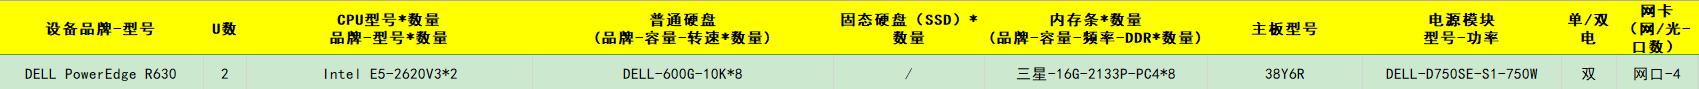 DELL PowerEdge R630 Intel E5-2620V3*2 DELL-600G-10K*8 三星-16G-2133P-PC4*8